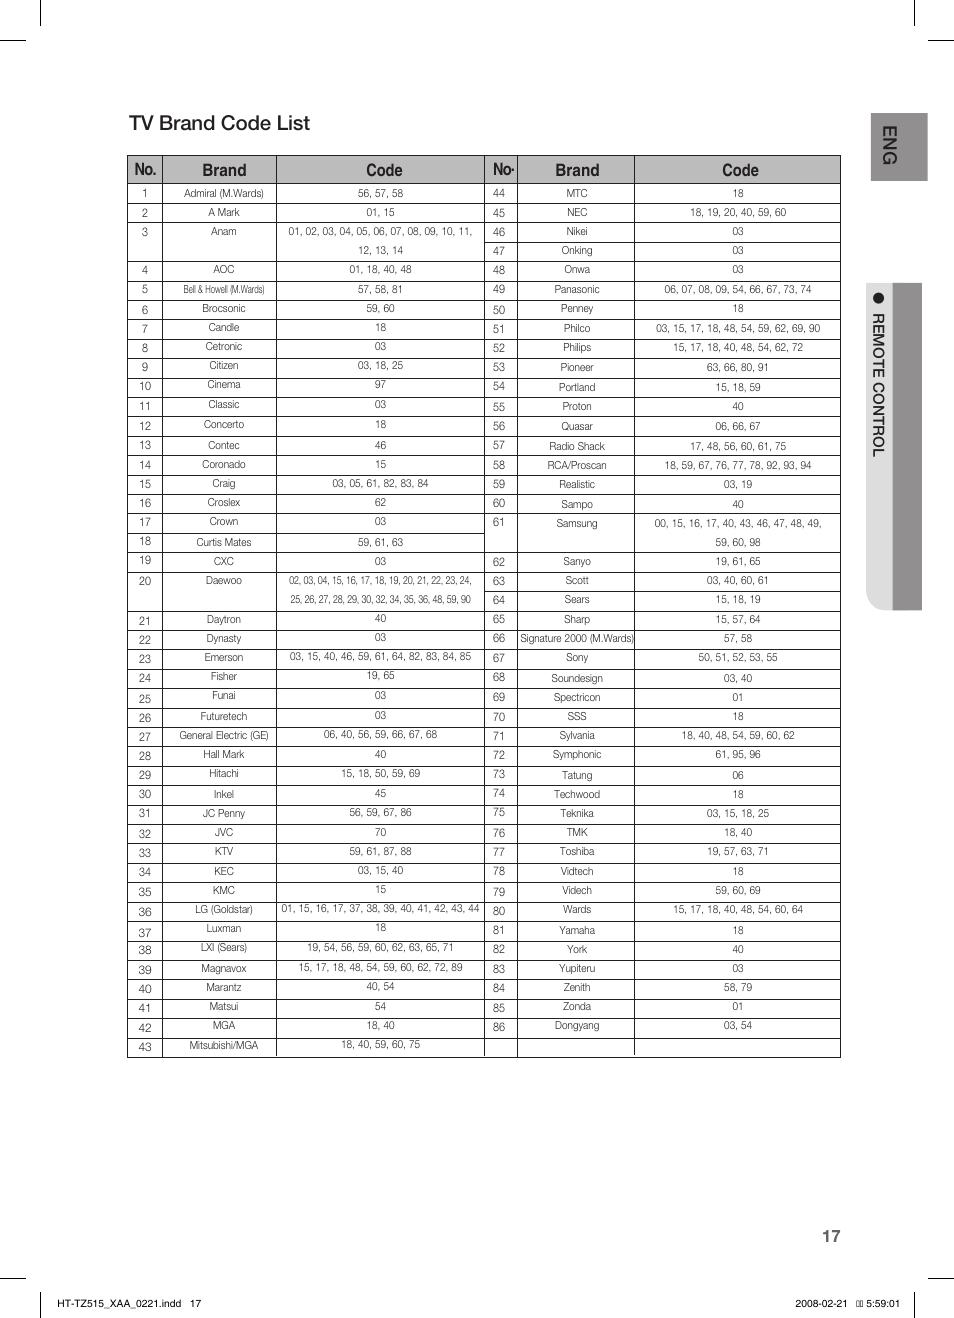 Tv brand code list, No. brand code no. brand code, R emote